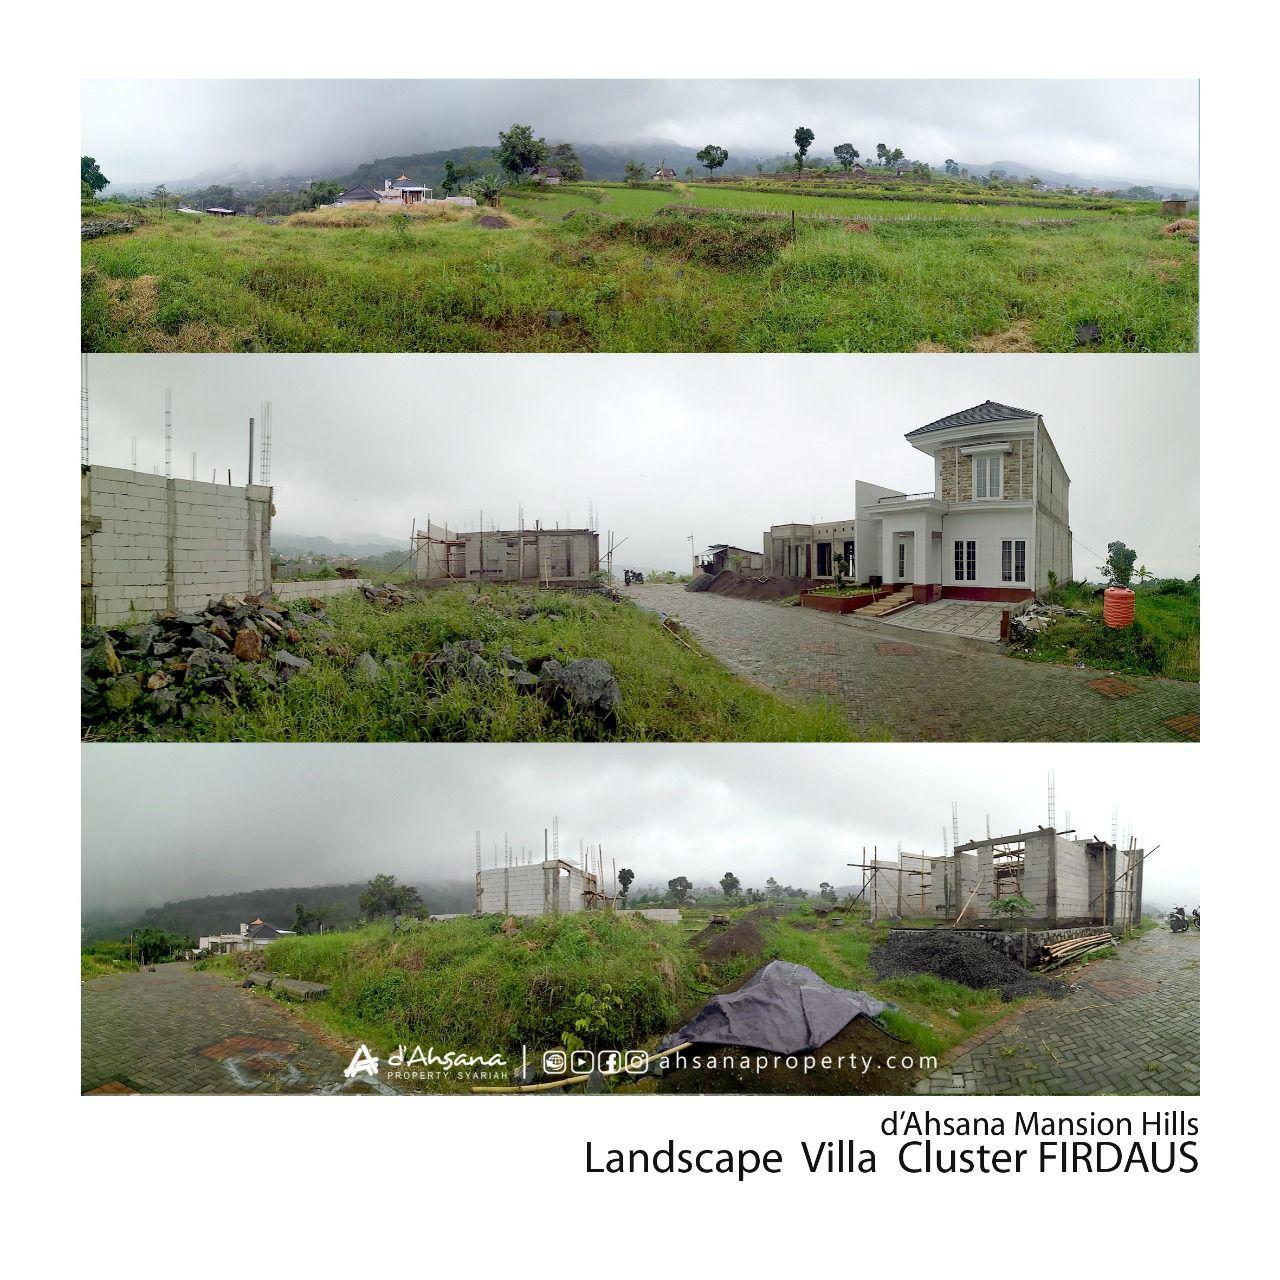 lokasi villa produktif ahsana mansion hills pacet